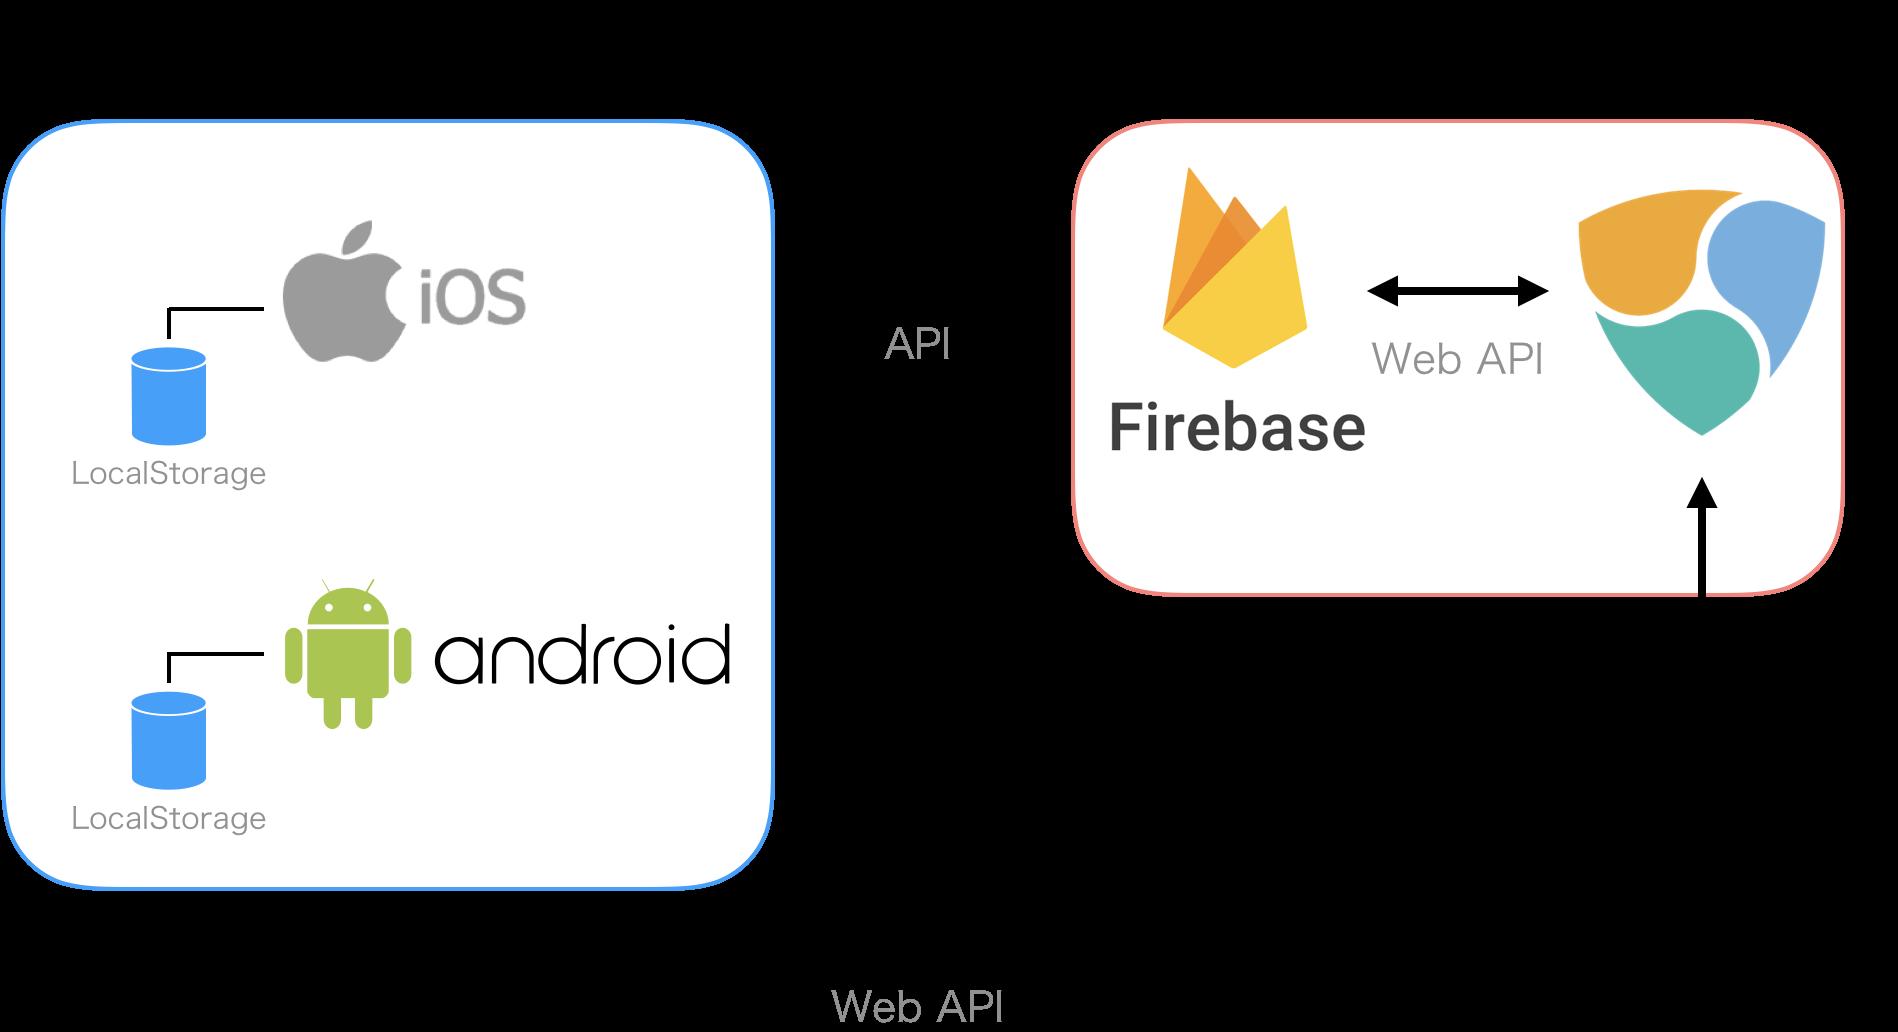 application_nem_ec_mobile.png